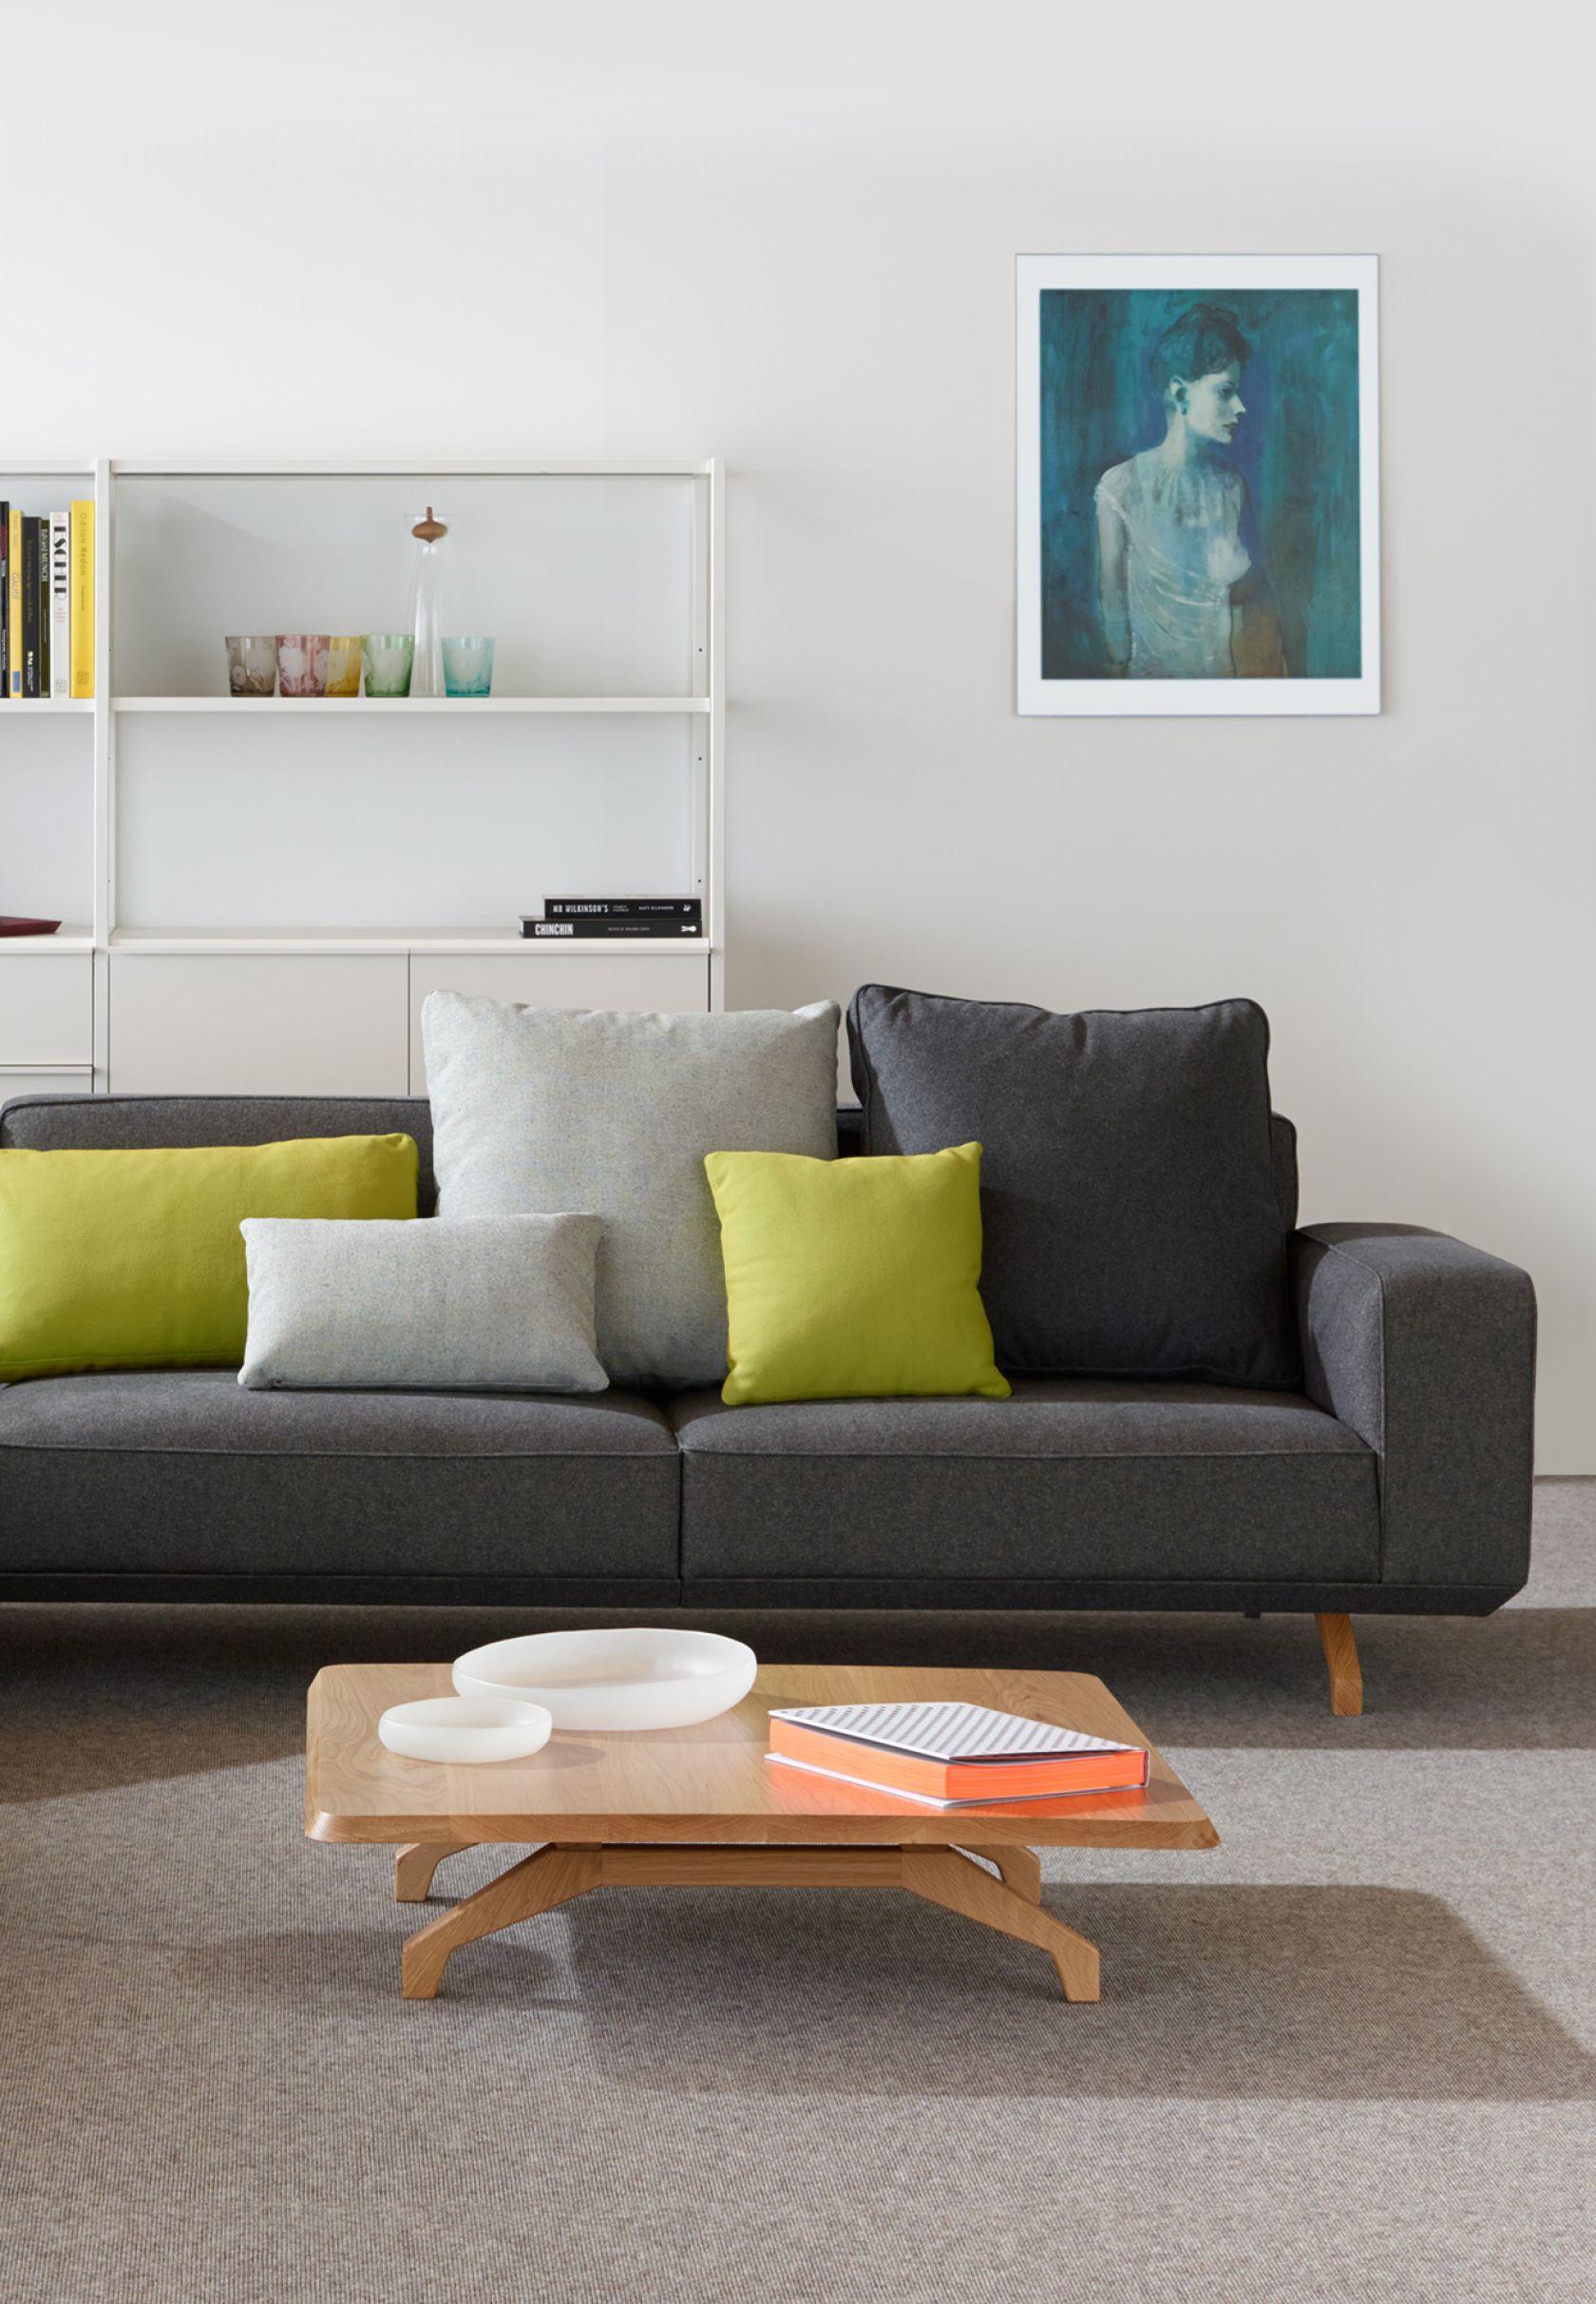 Bomba Table, Bomba Sofa Kase Storage and Scatter Platter Cushions